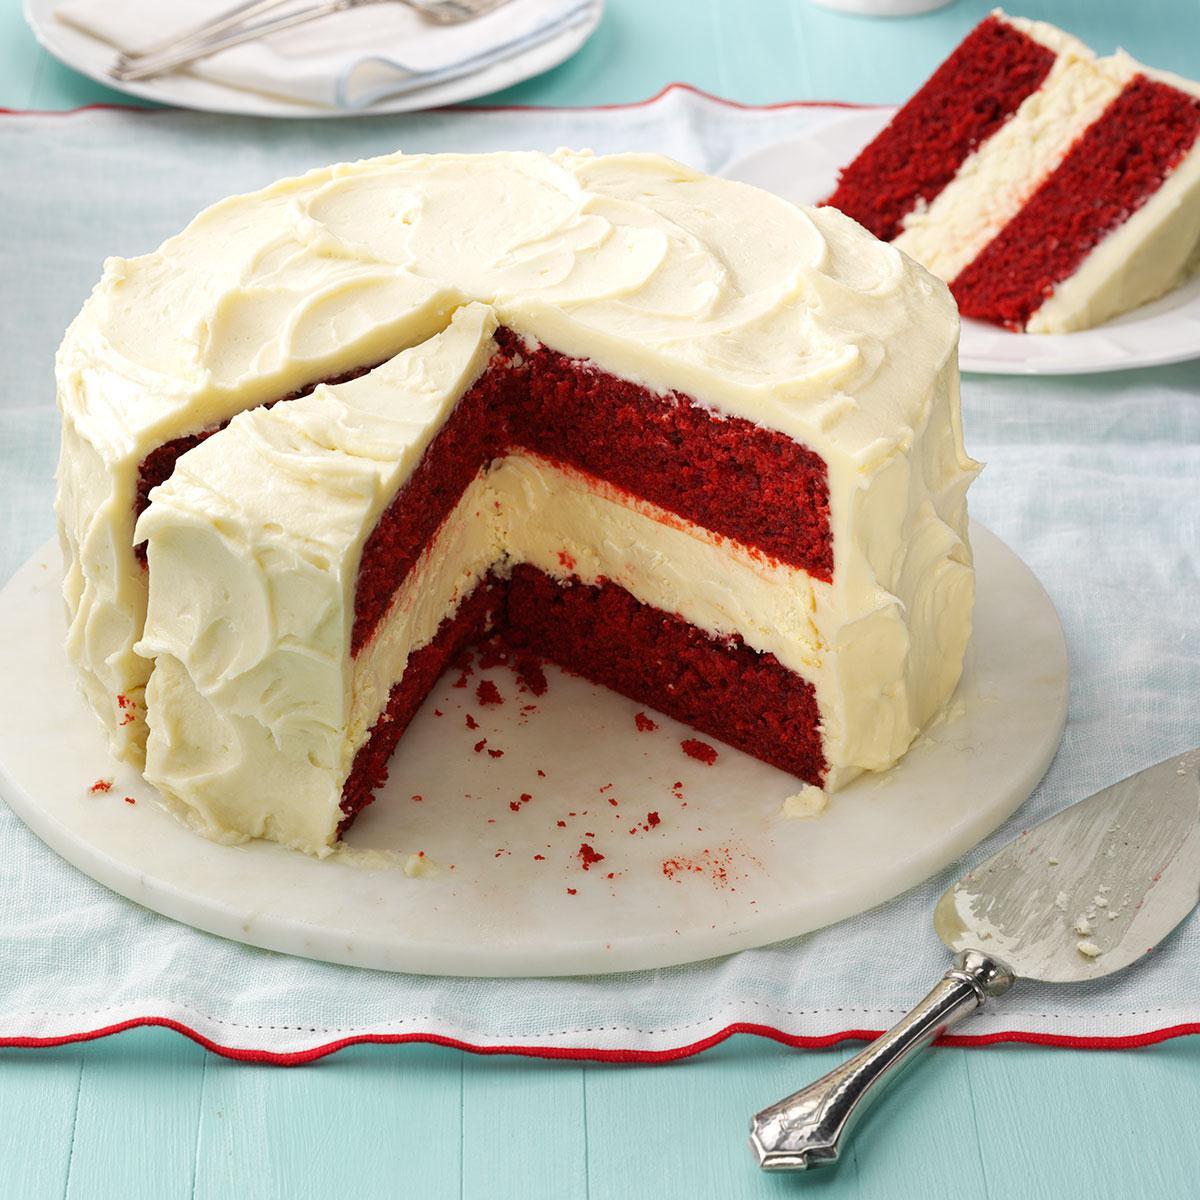 Red Velvet Cheesecake Recipe  Cheesecake Layered Red Velvet Cake Recipe